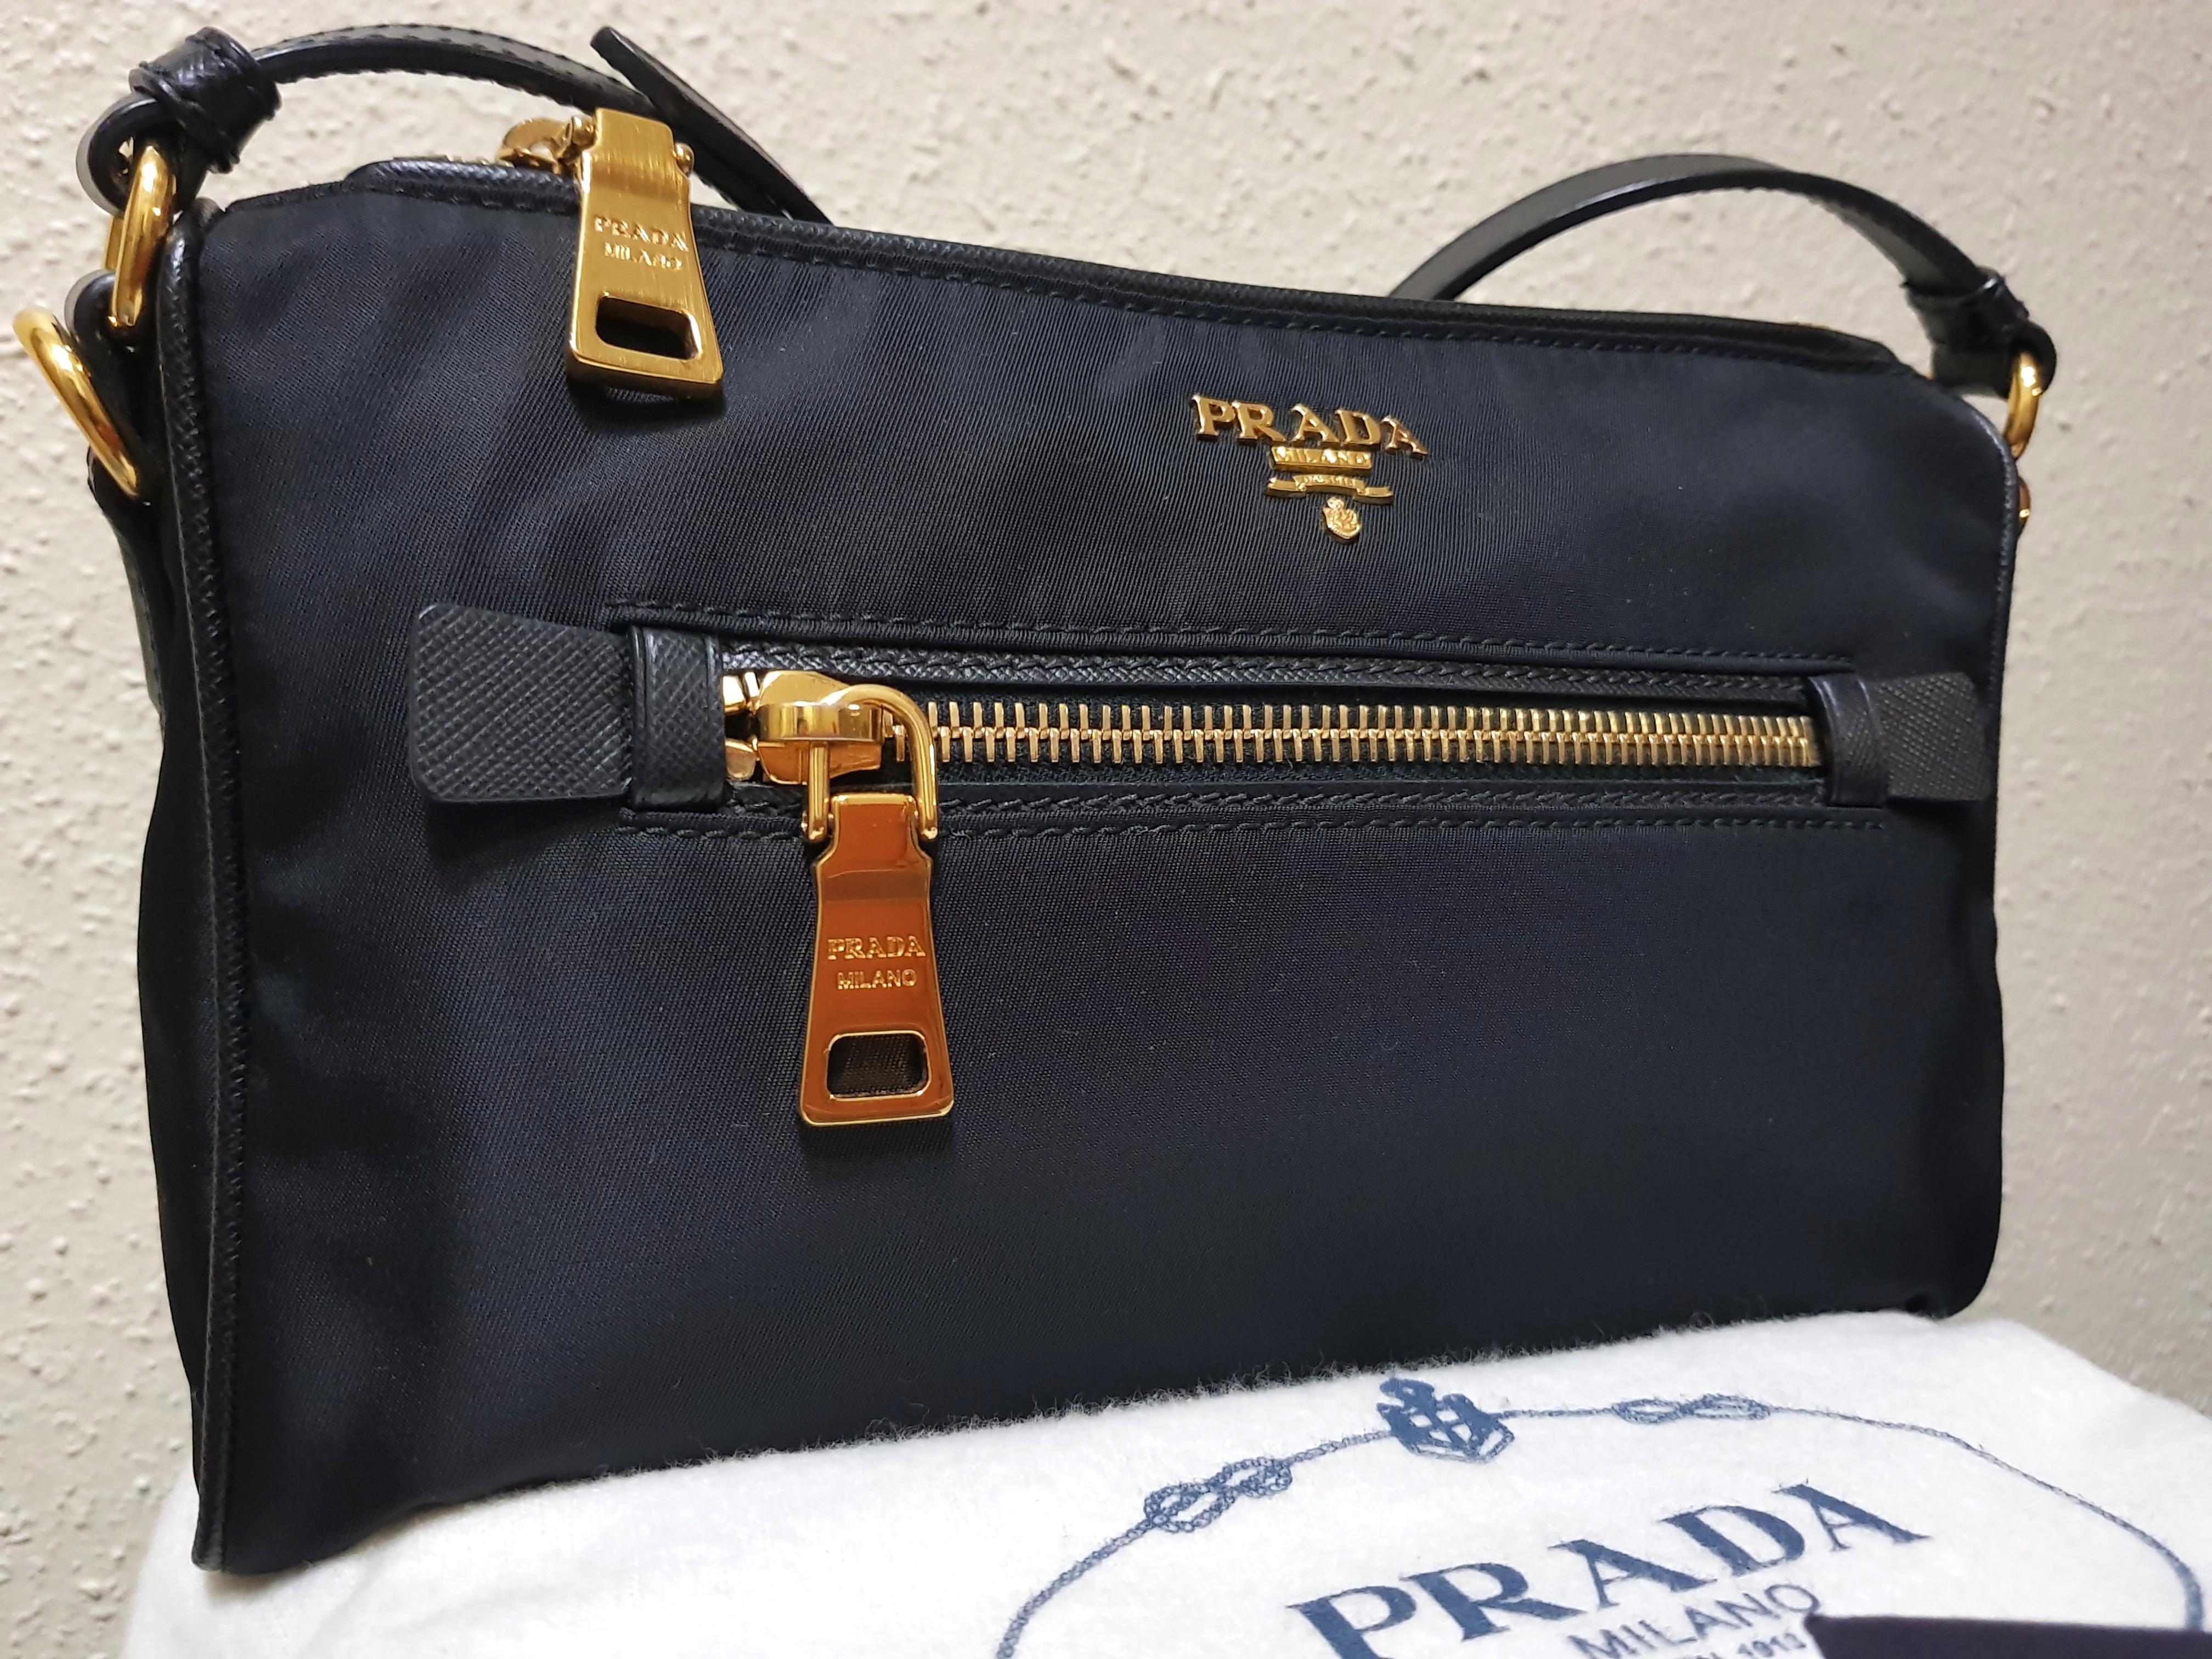 Price Reduced Prada Tessuto Saffiano Nylon Bag Luxury